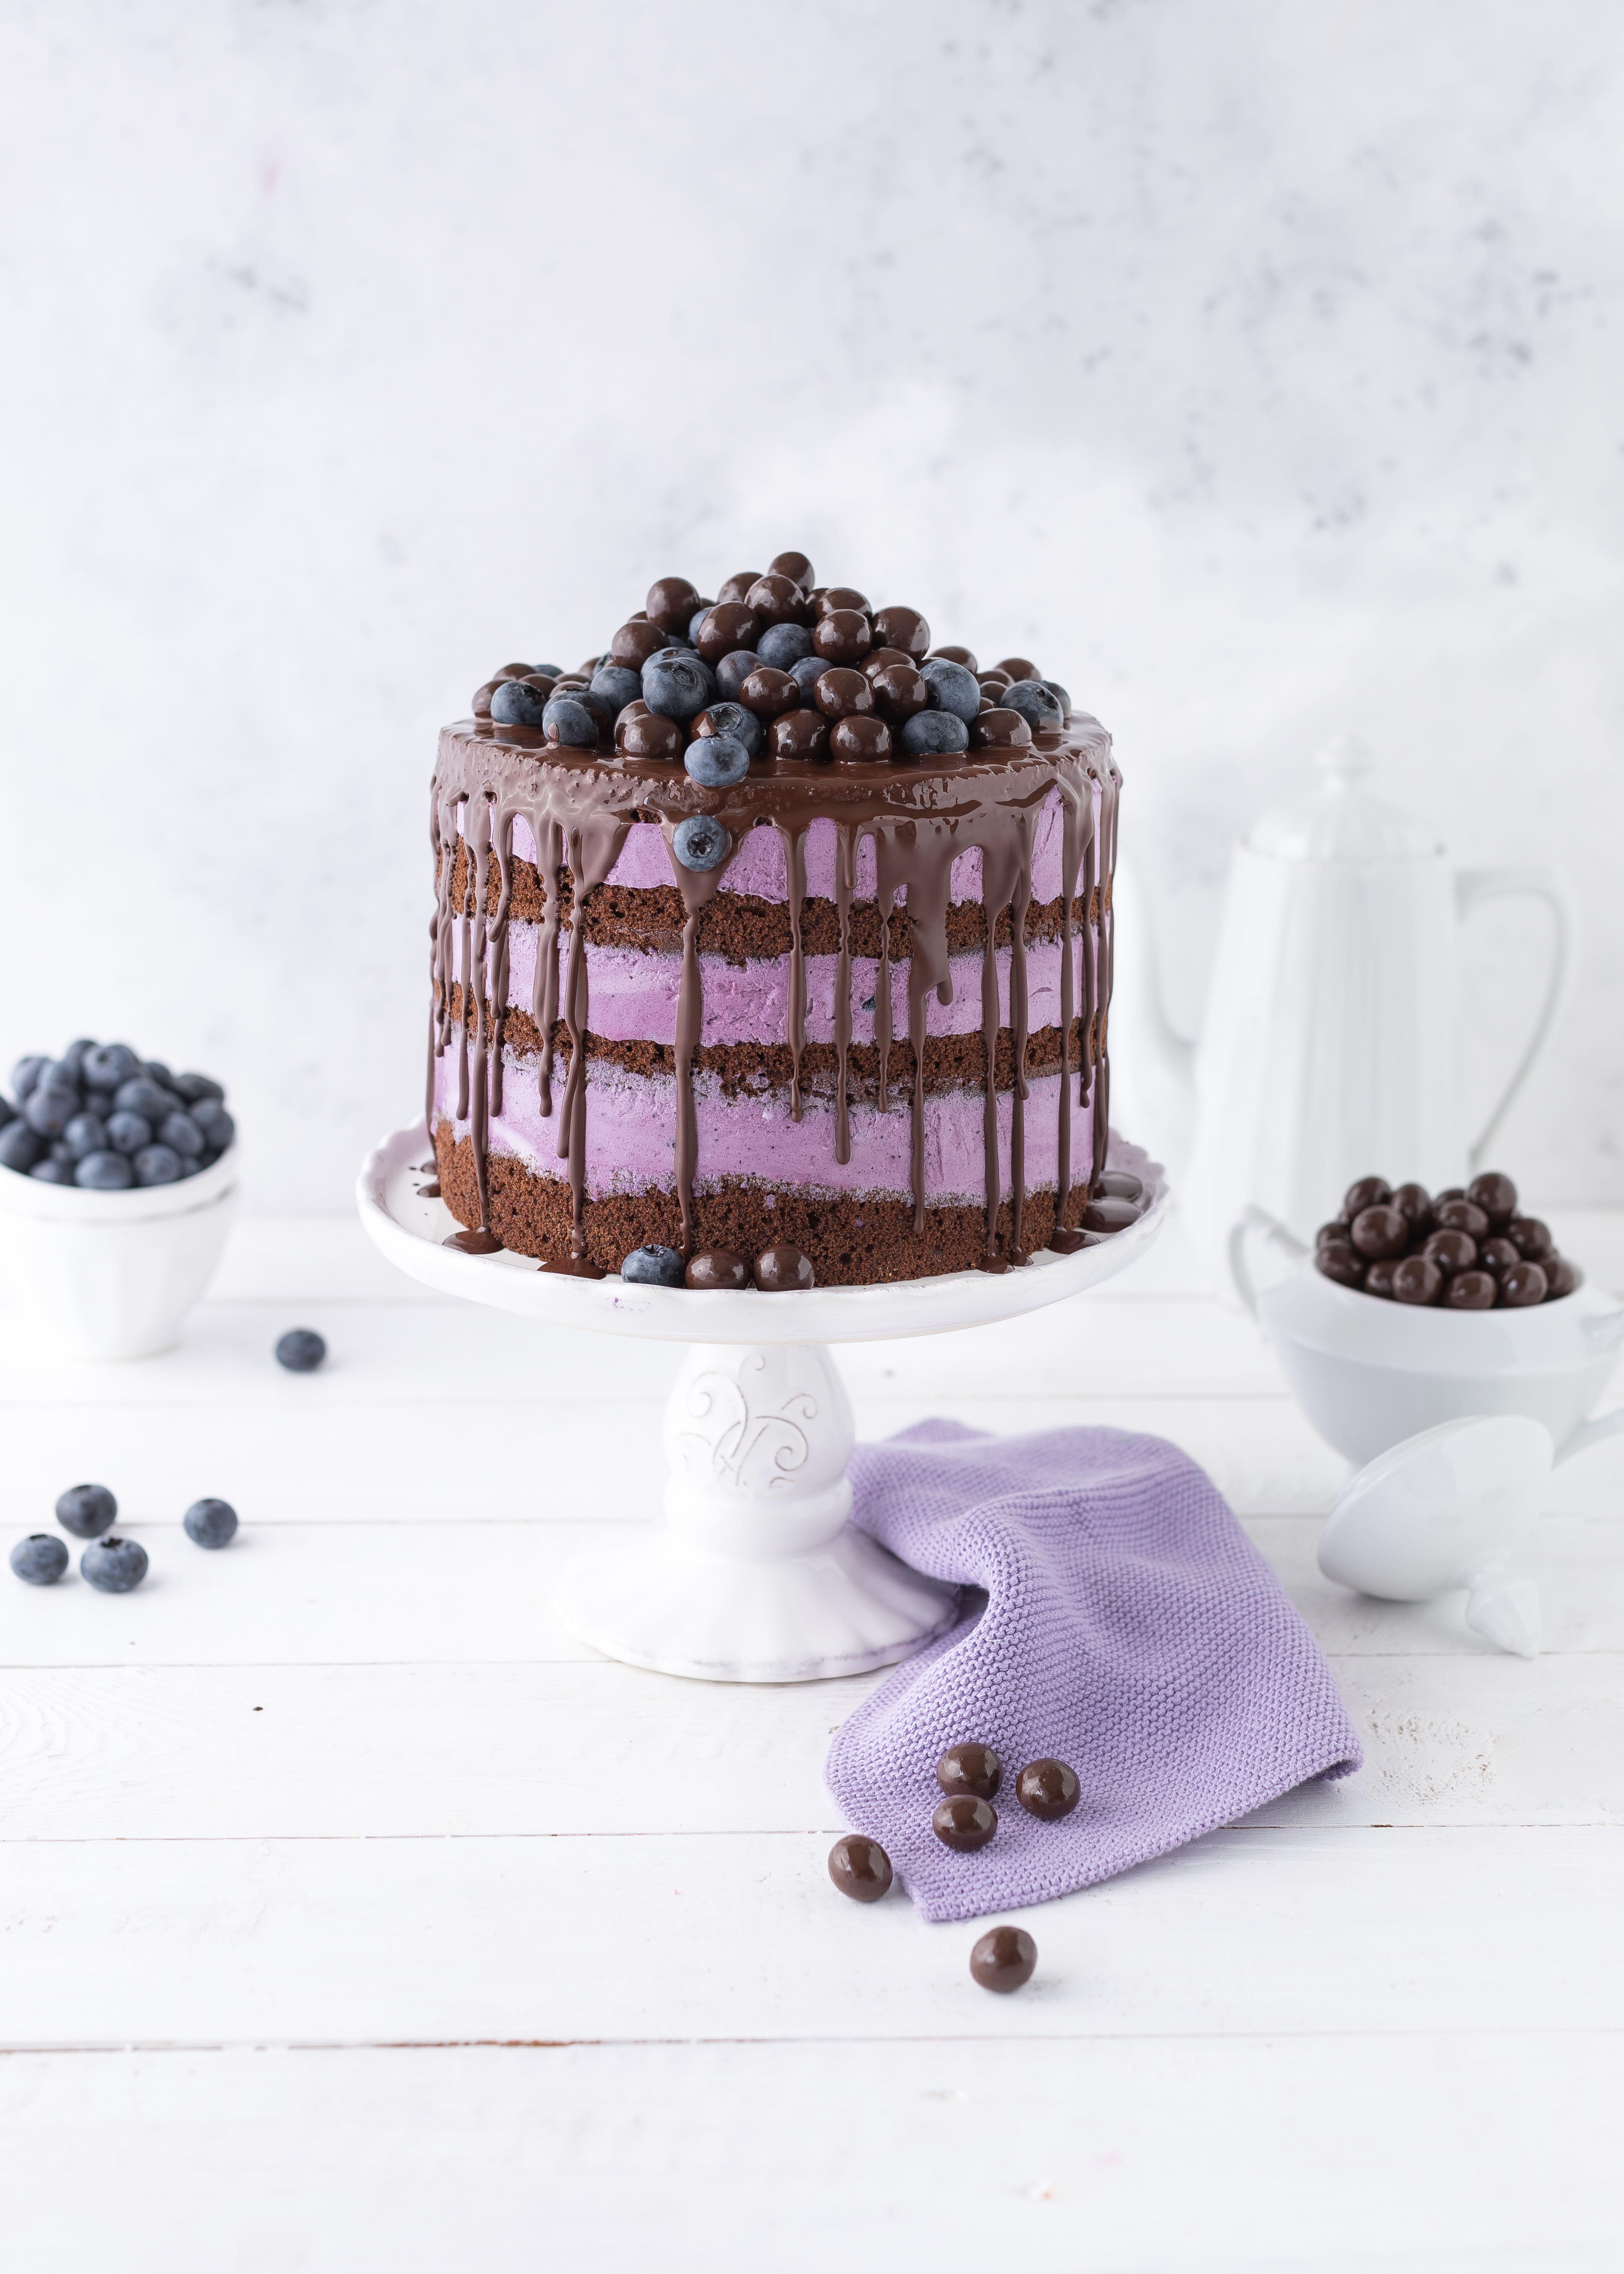 Blaubeer Drip Cake Rezept Torte Layer Cake backen Heidelbeeren Schokolade backen #dripcake #layercake #torte #cake #blaubeeren | Emma´s Lieblingsstücke